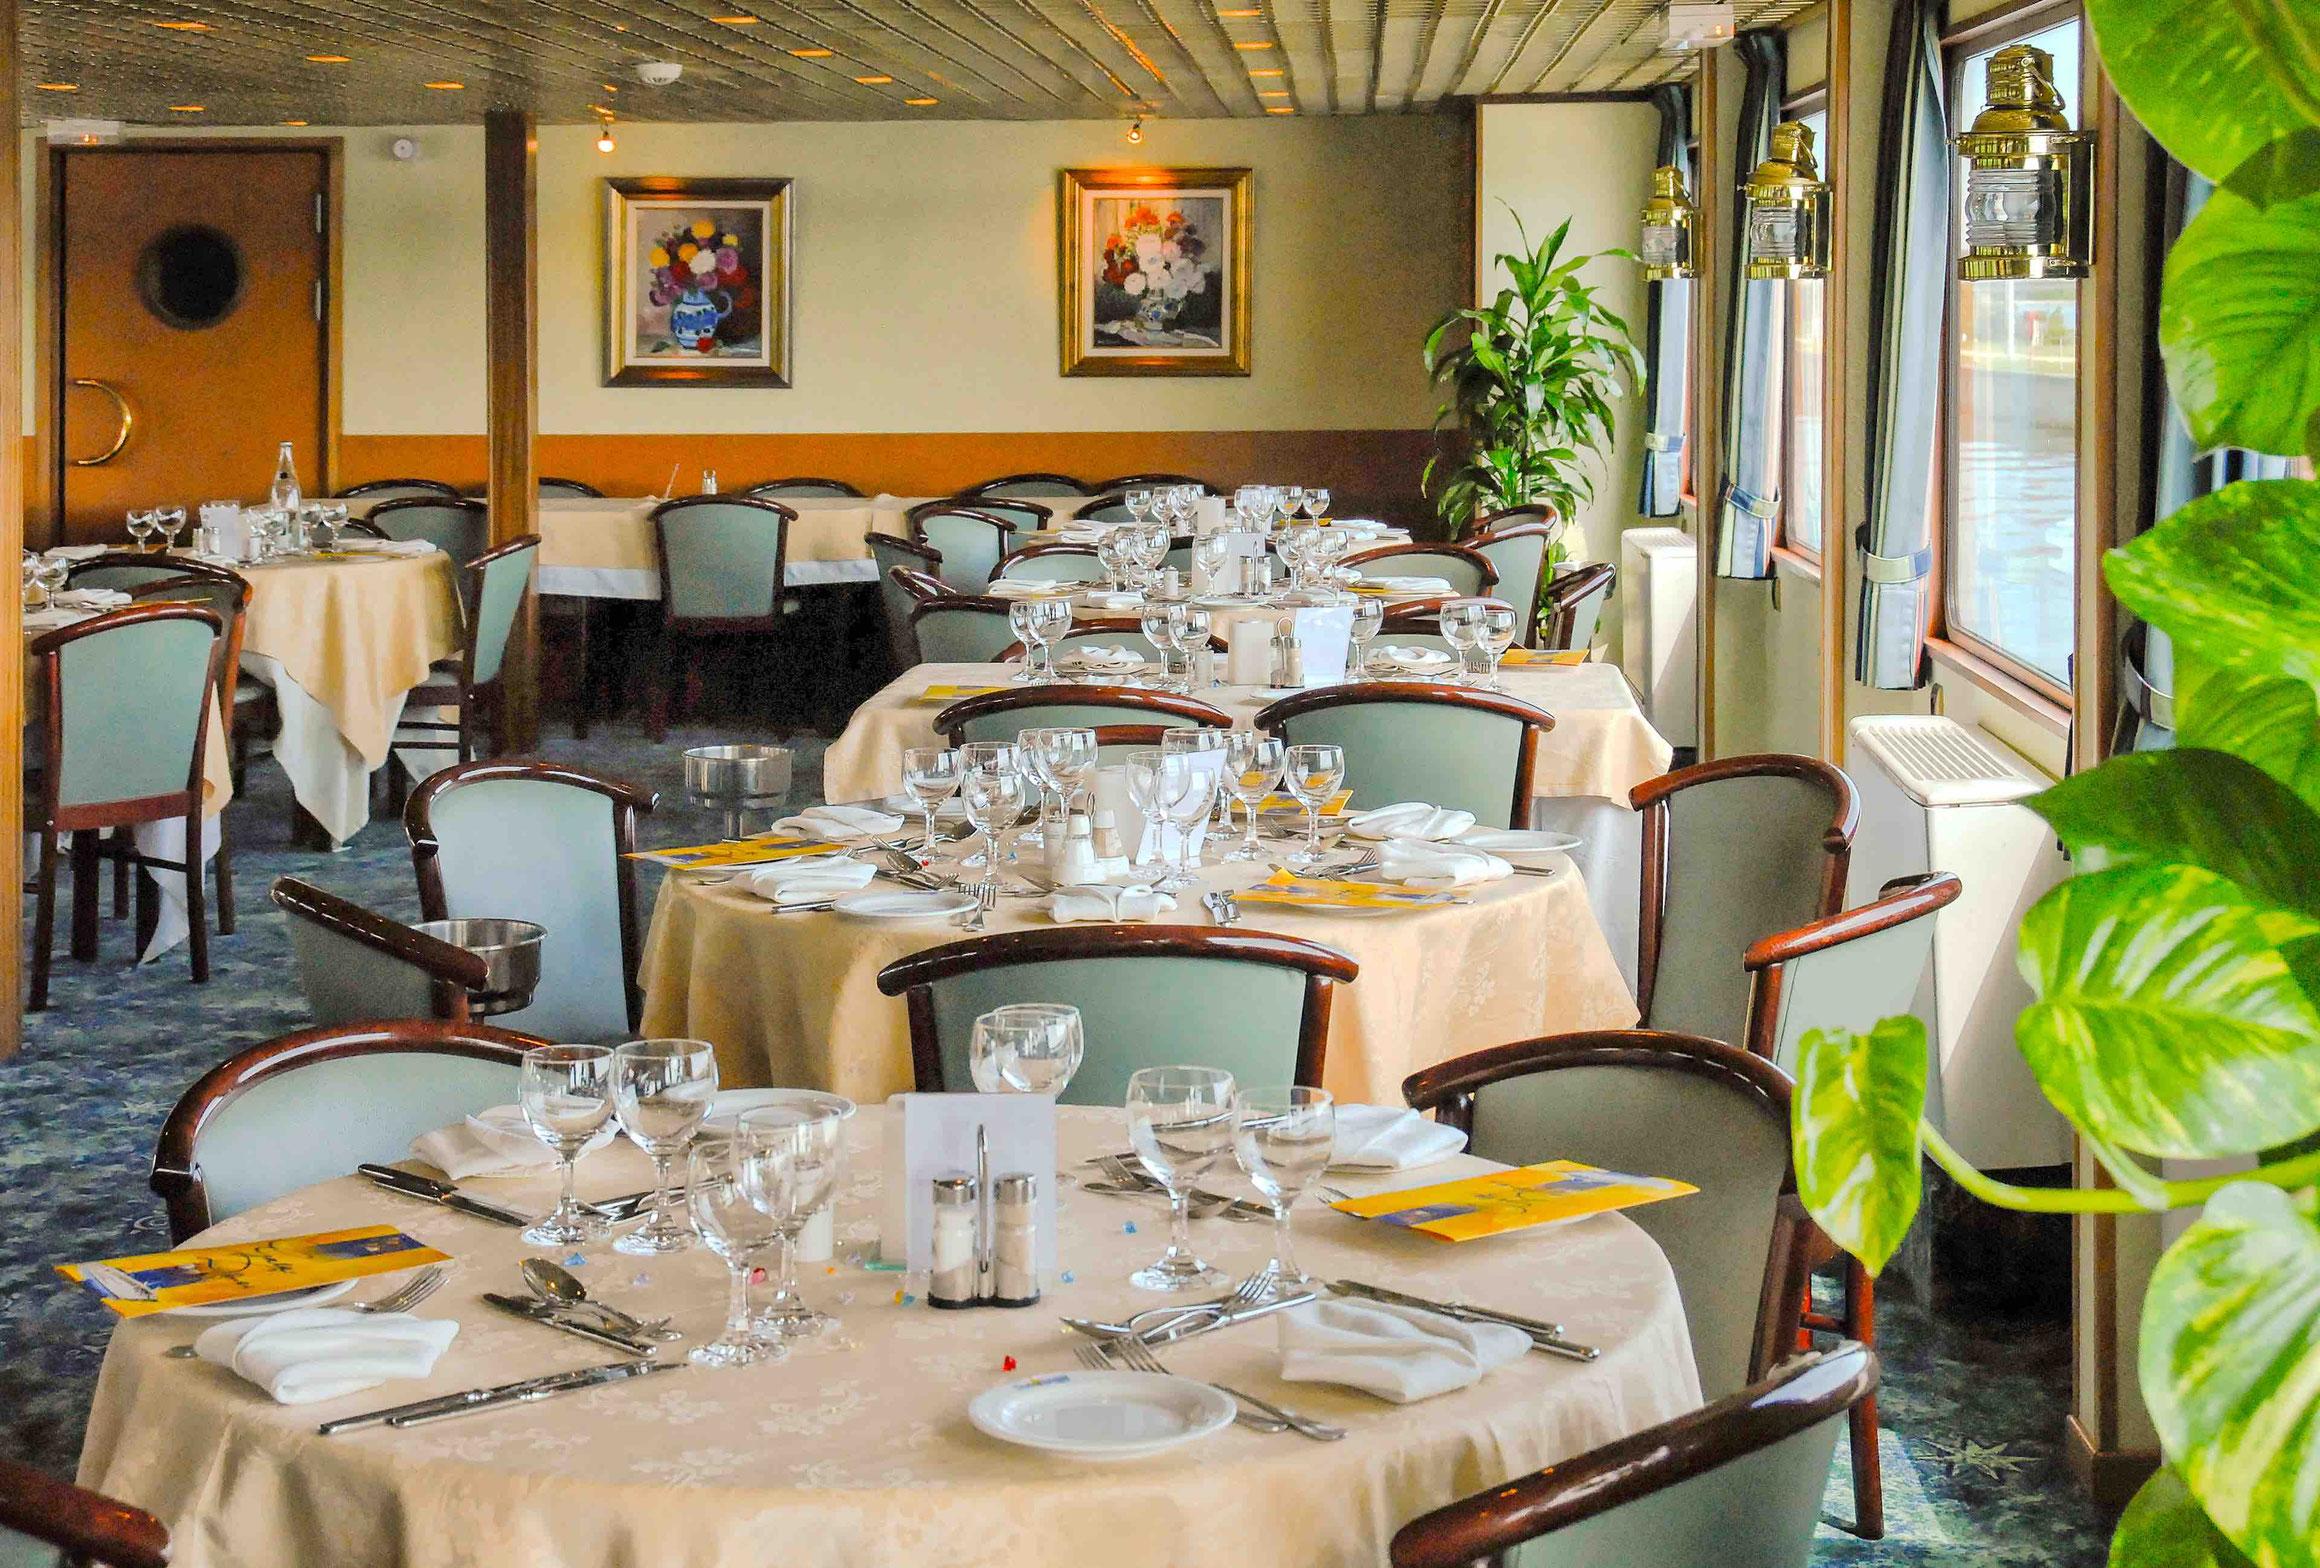 MS Modigliani Restaurant